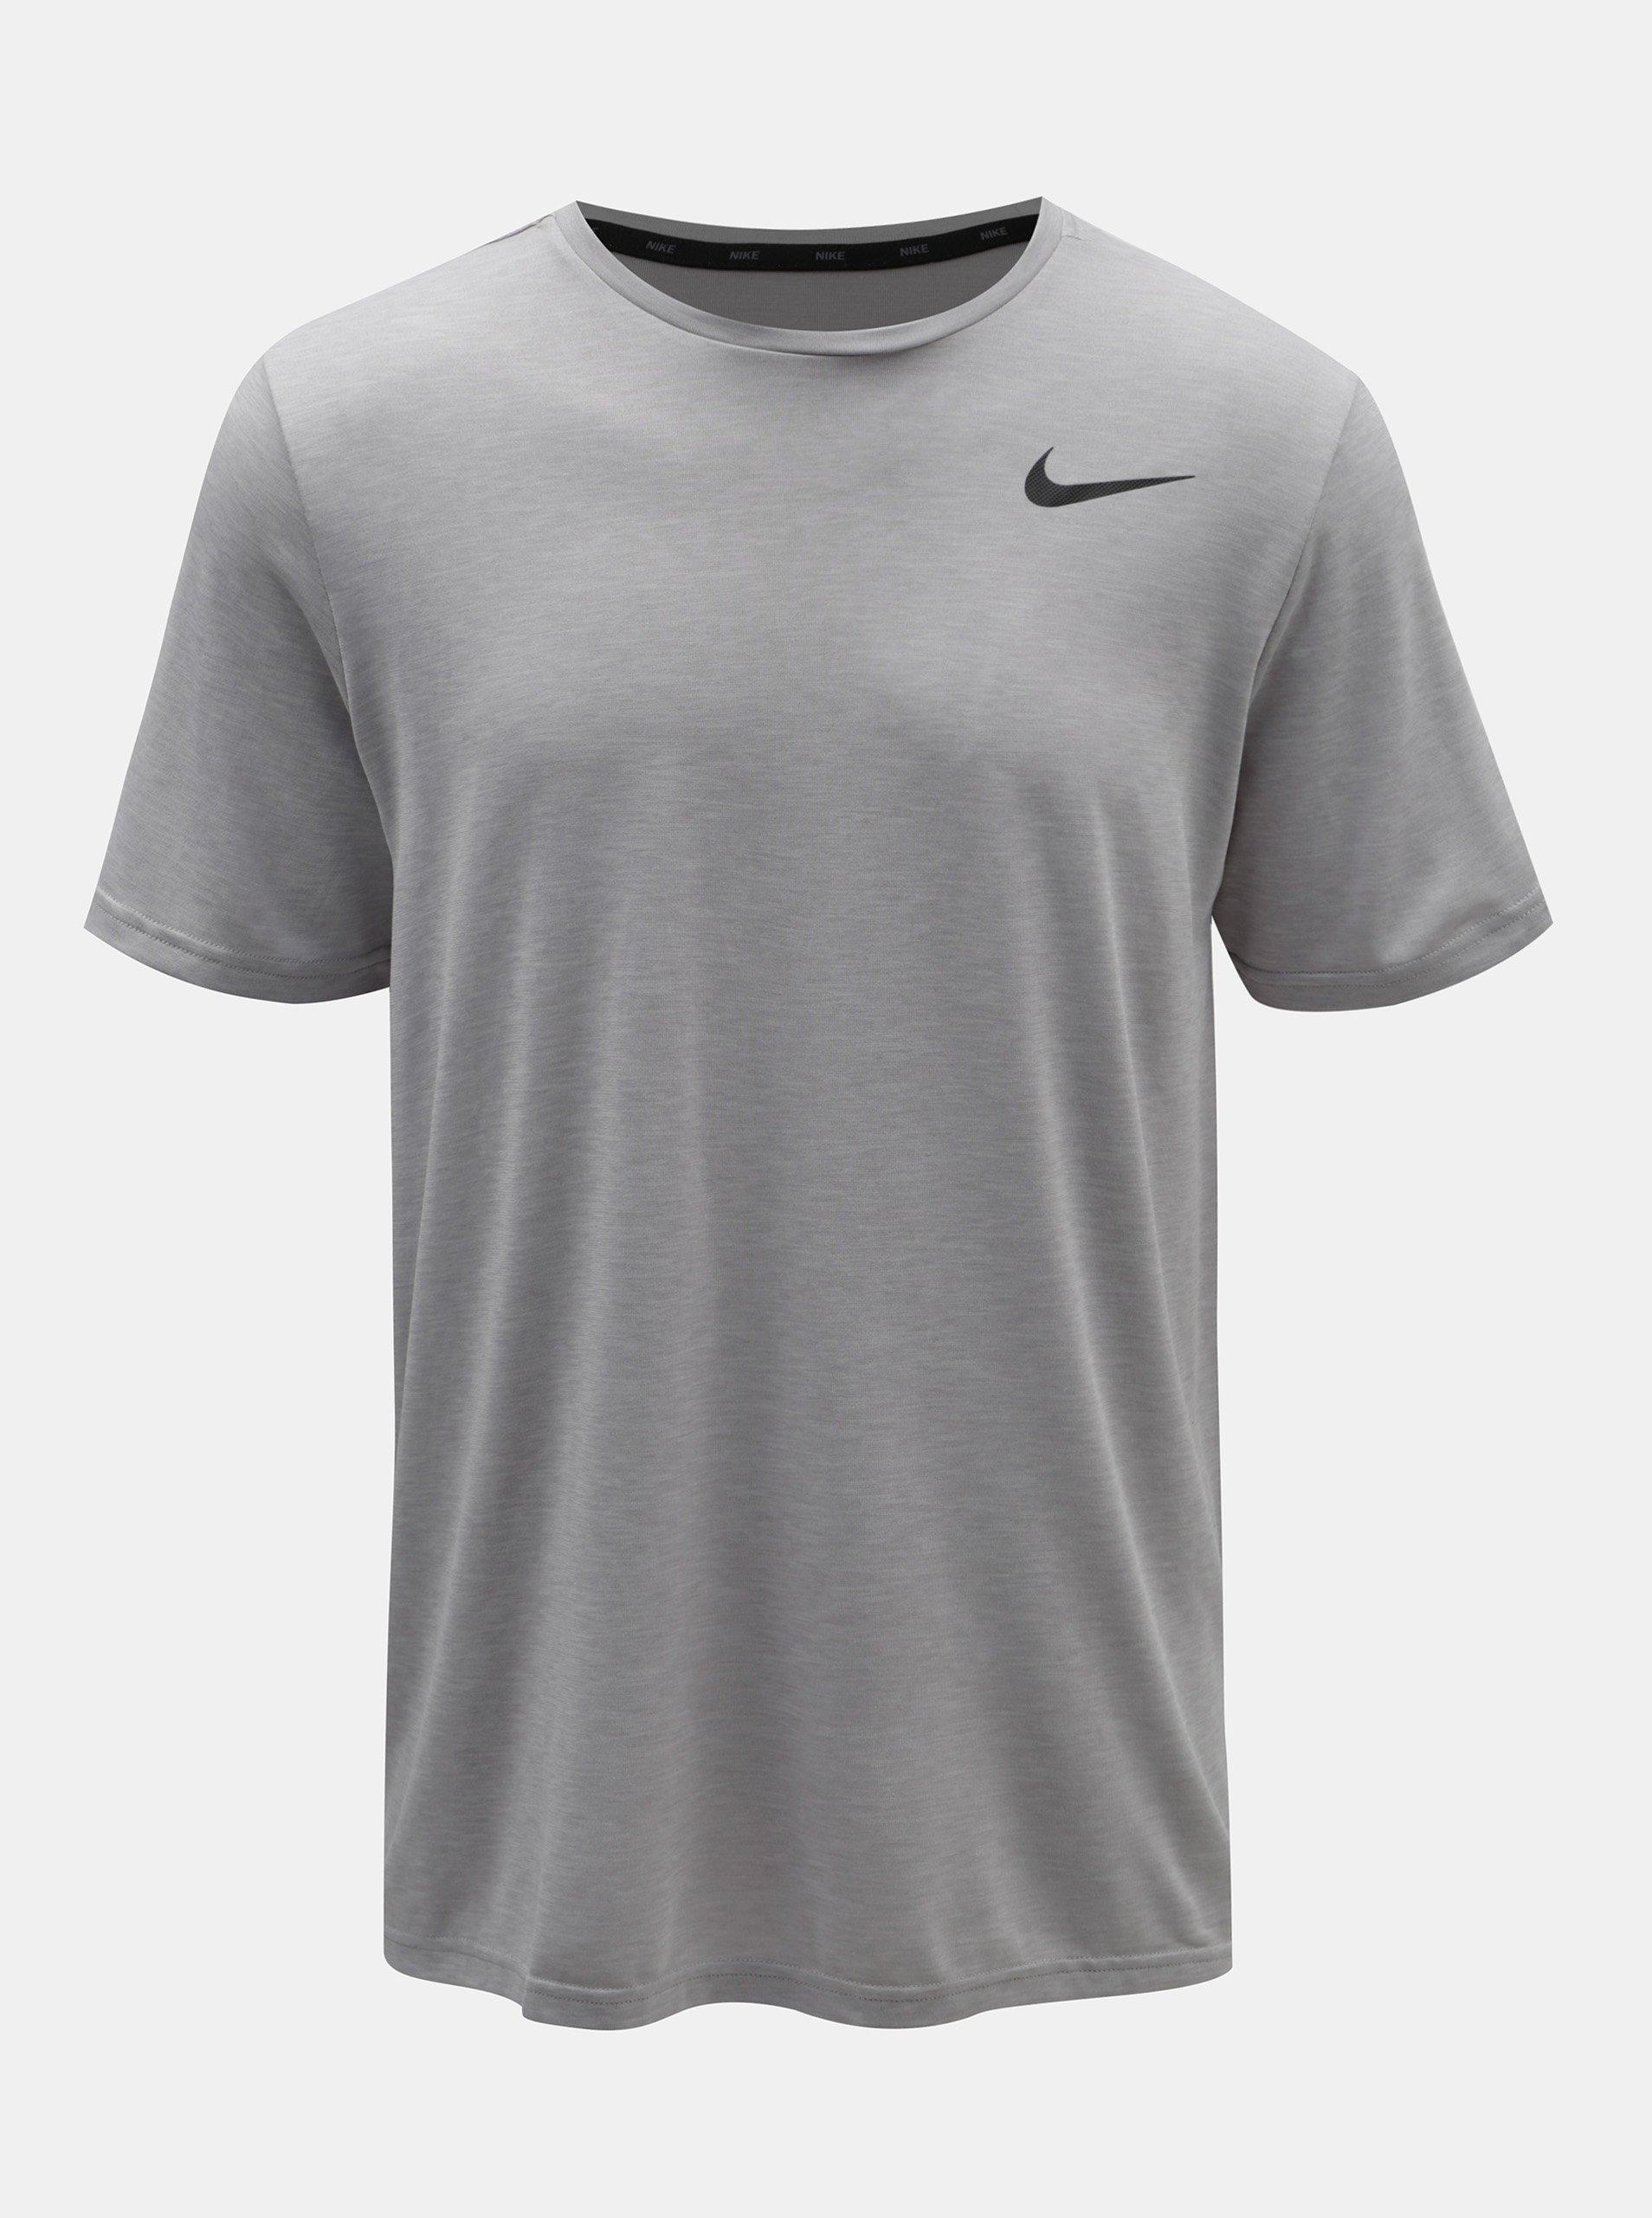 47a5baaa6f4 Šedé pánské žíhané tričko Nike